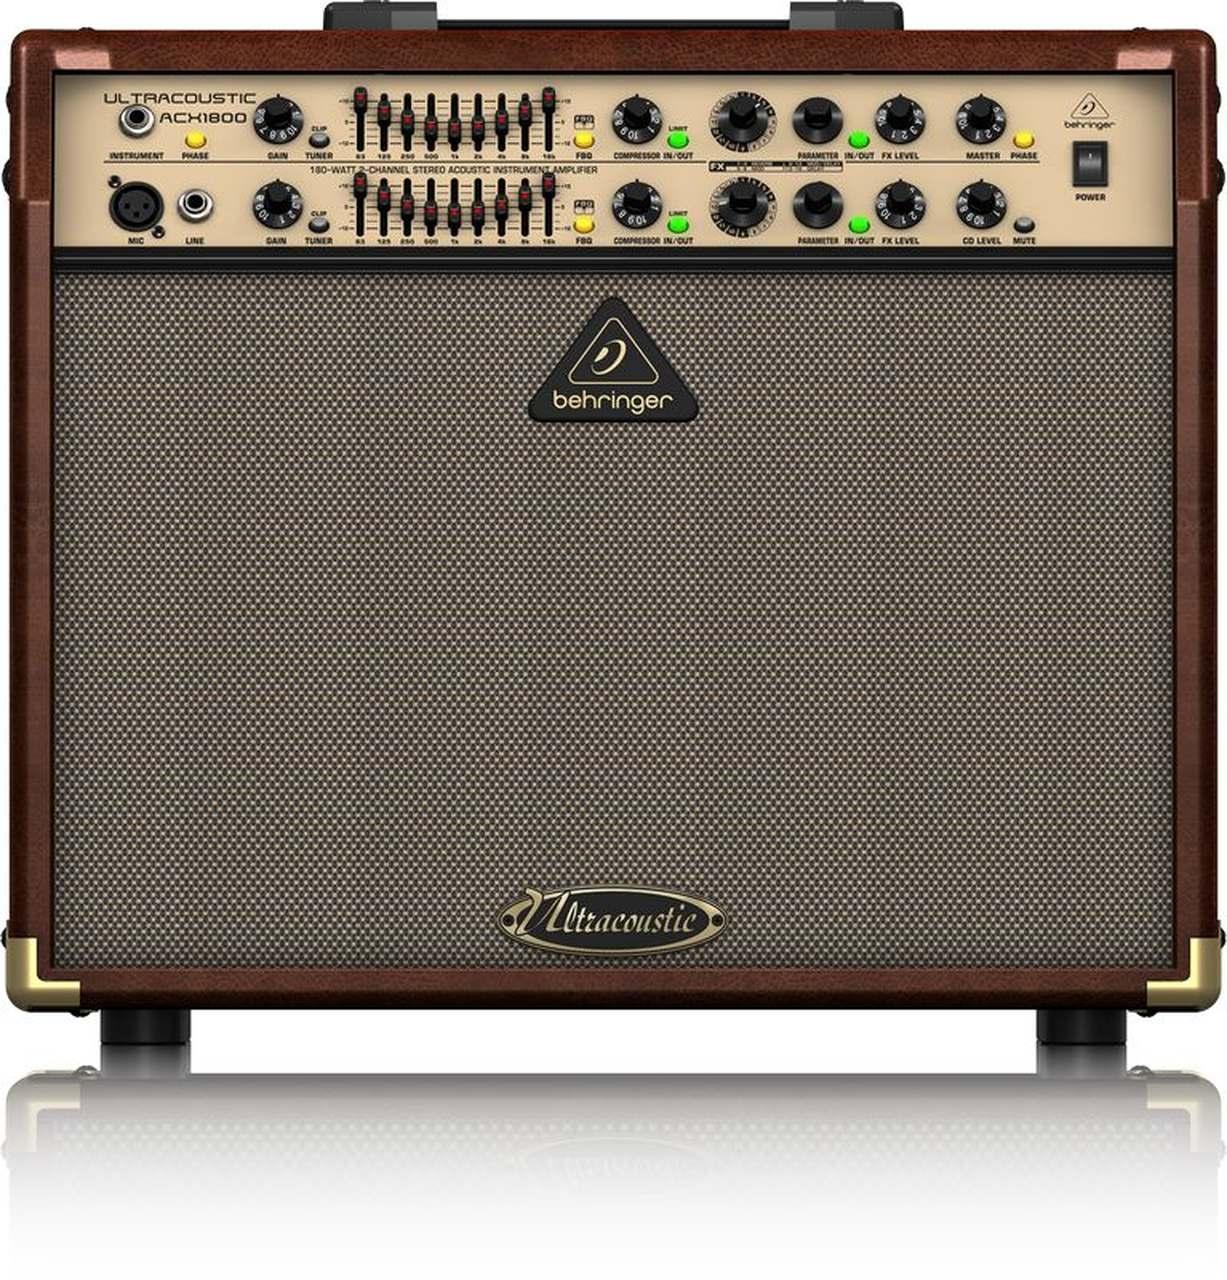 Caixa Amplificada Behringer Ultracoustic ACX1800 180W 2x8